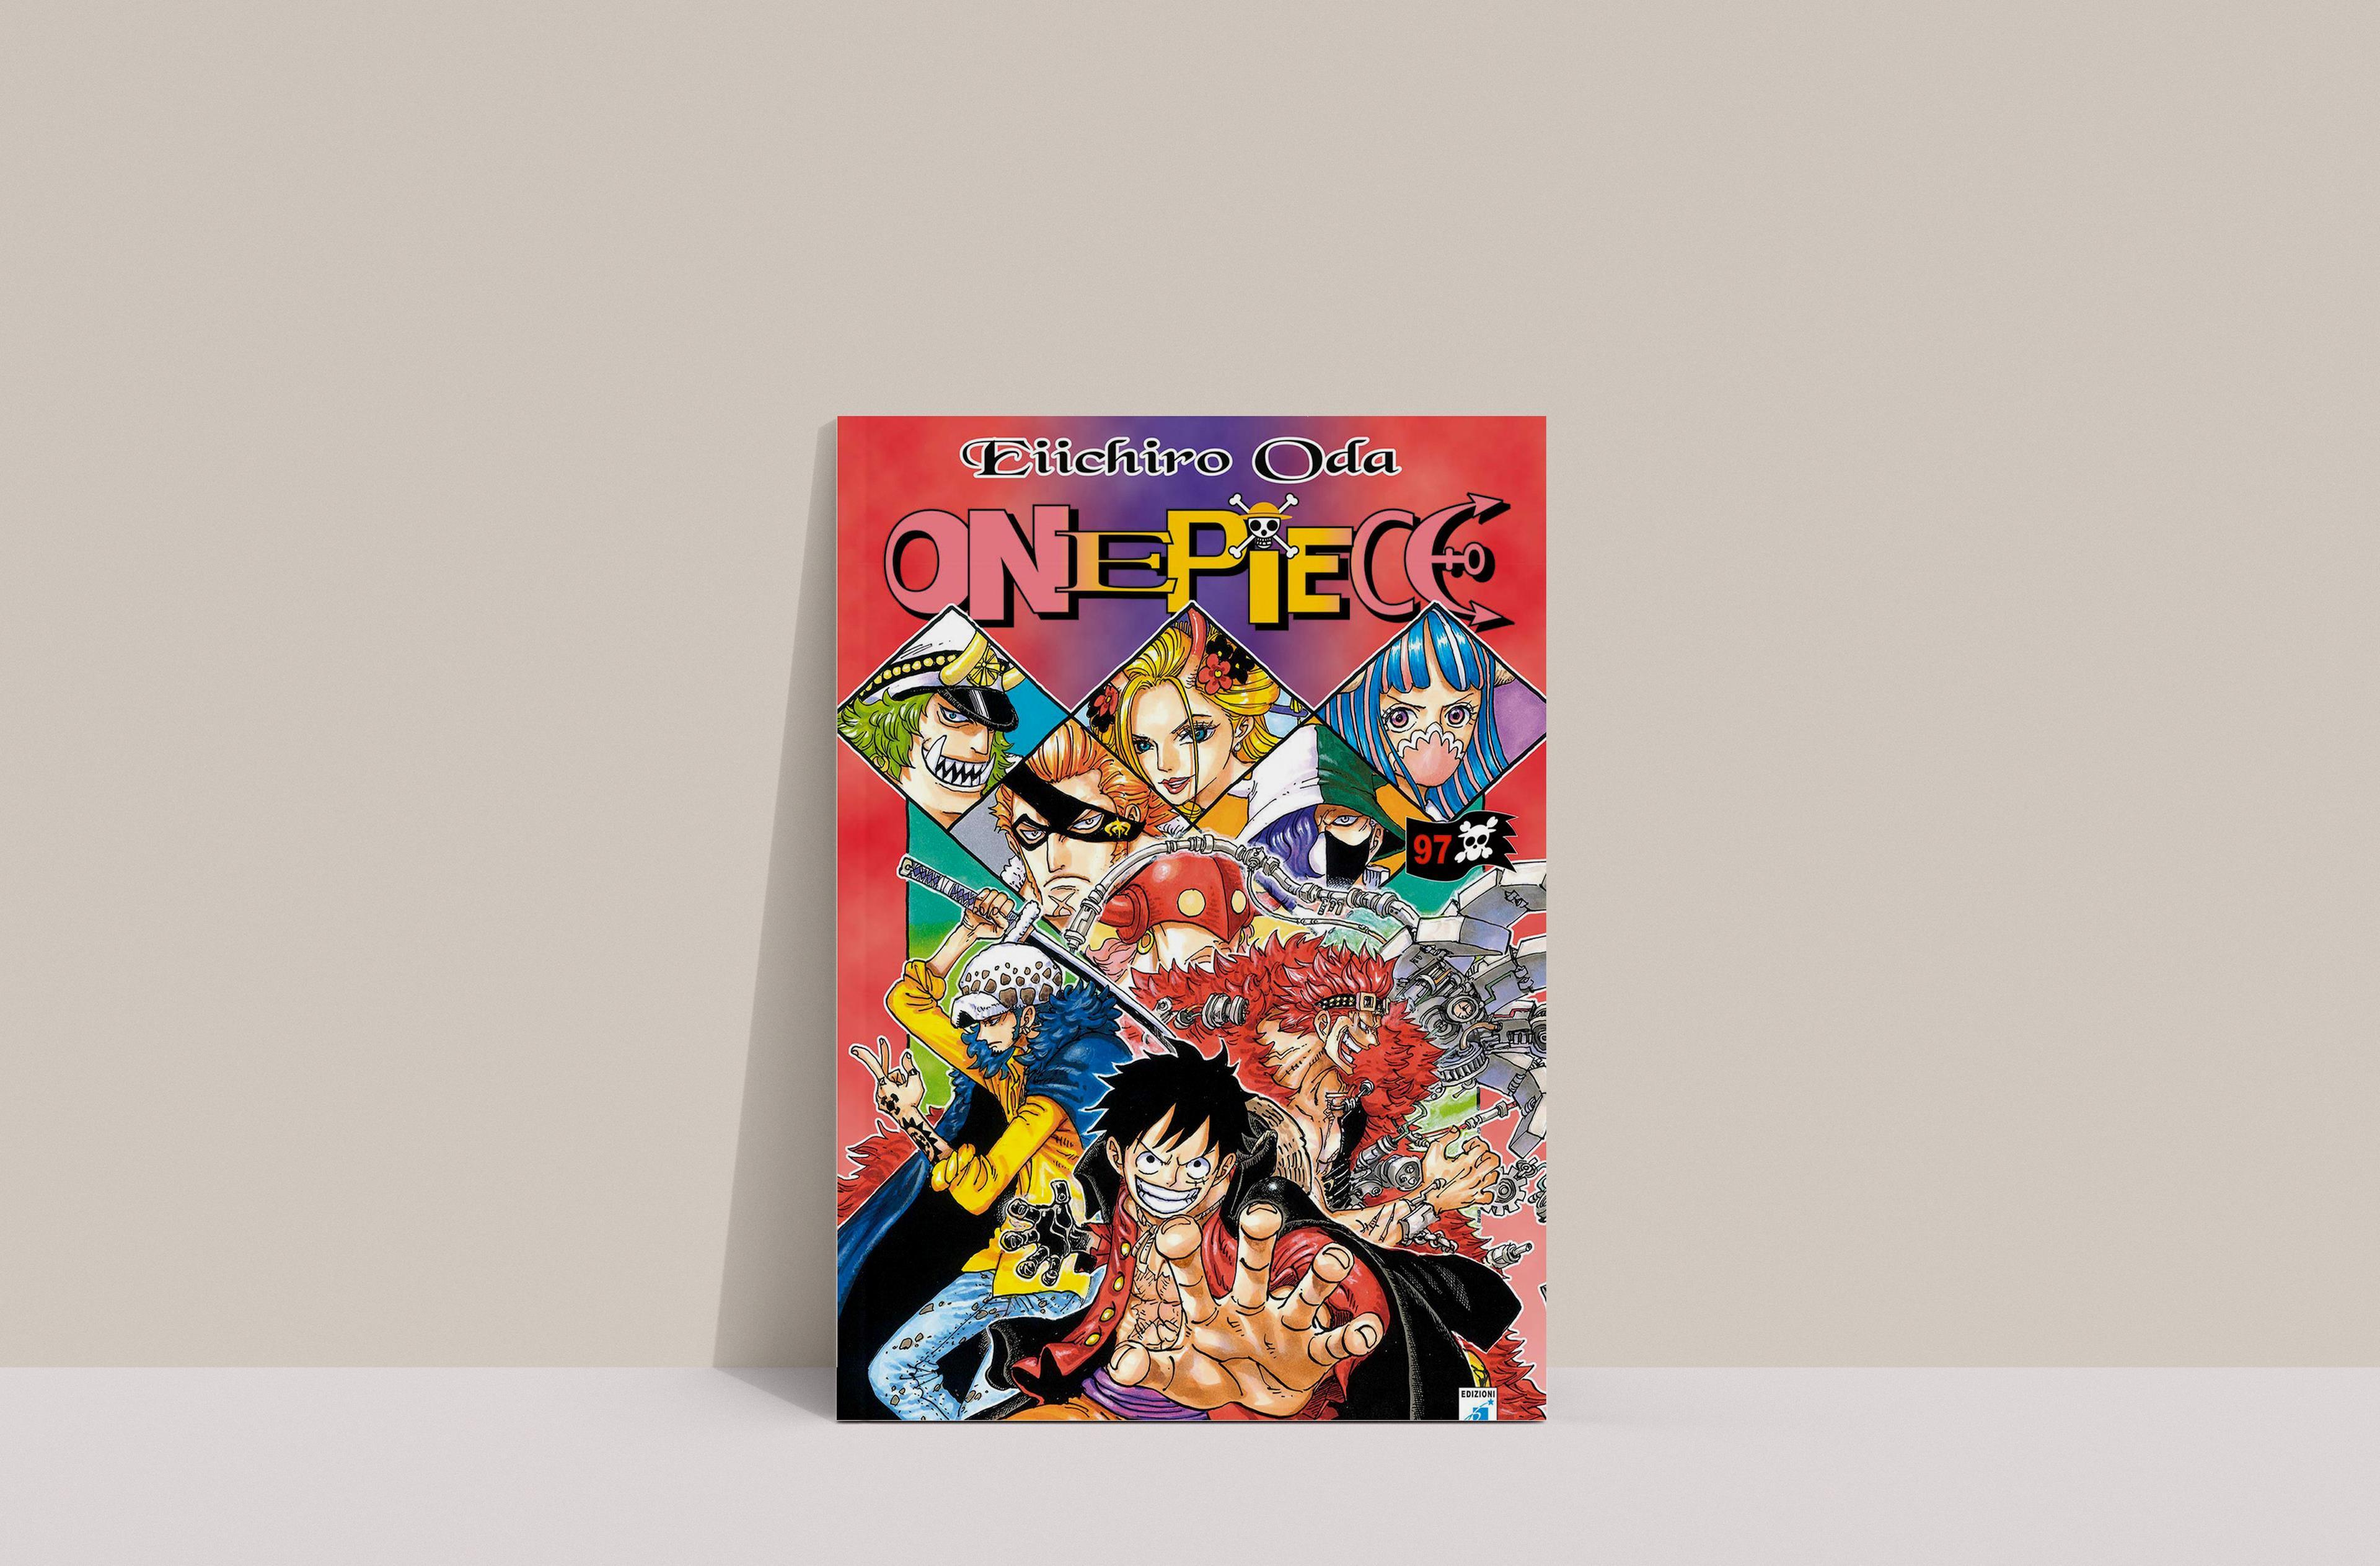 One Piece, il manga dei record